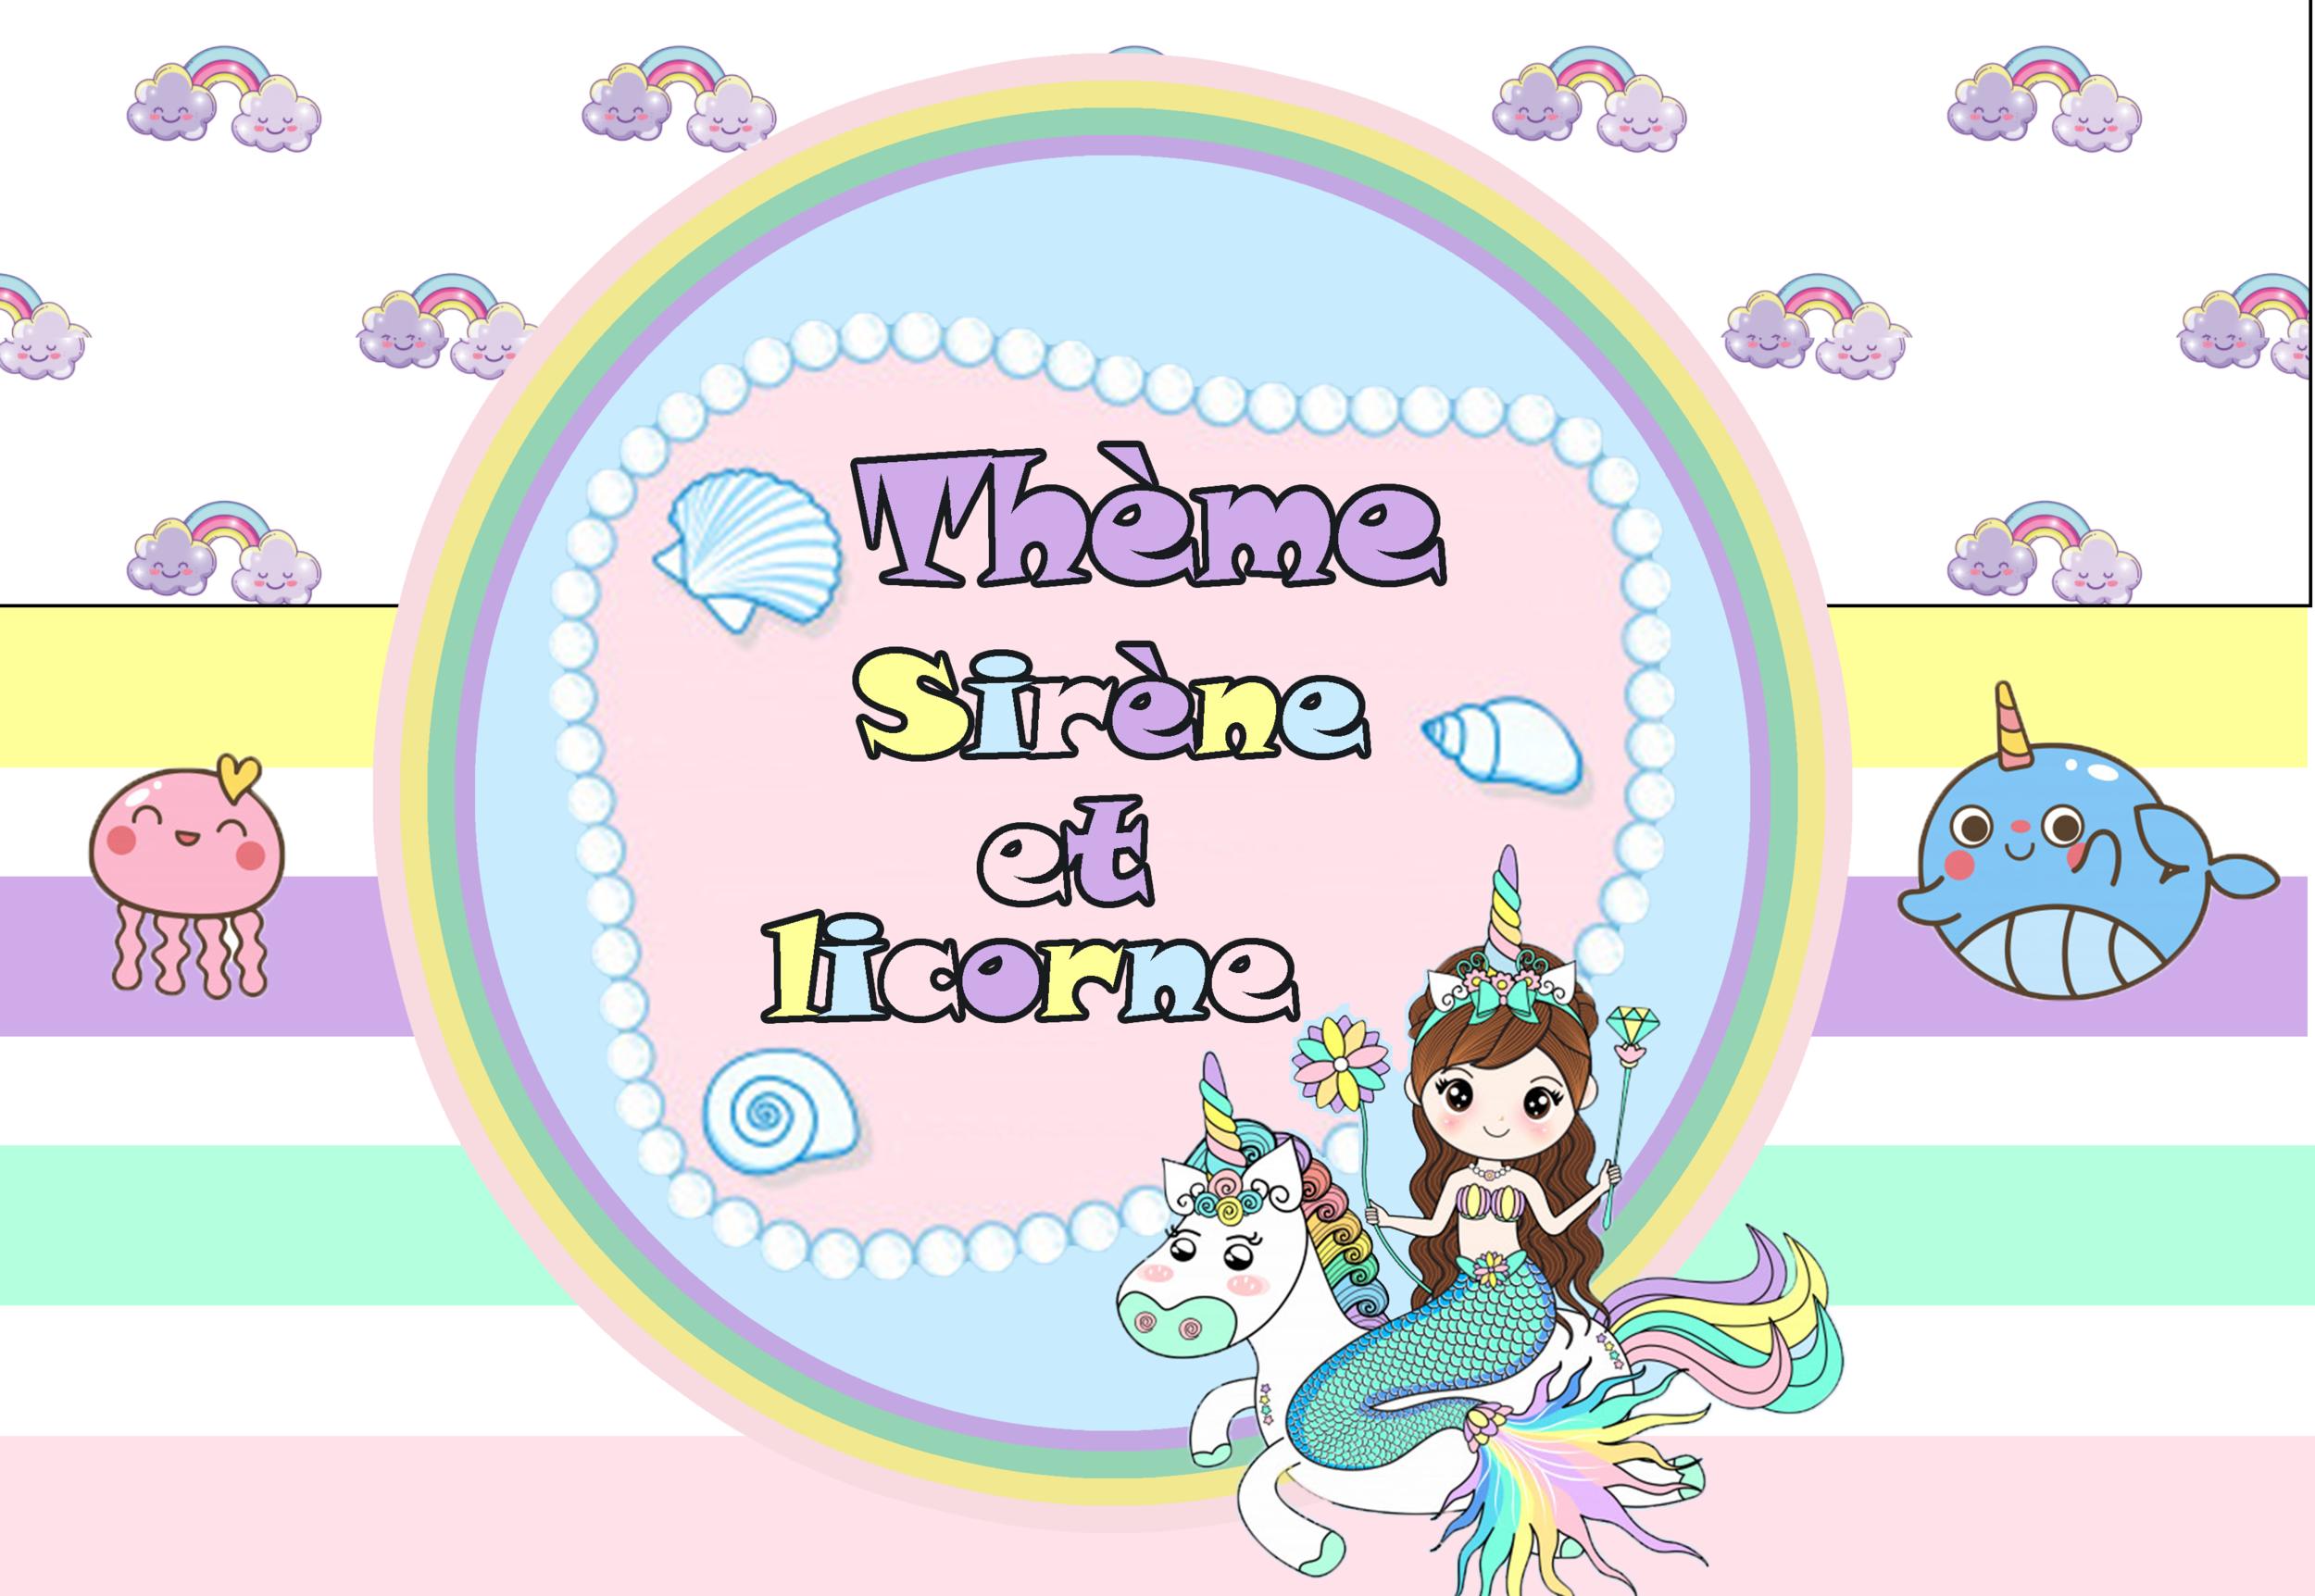 planche insi sirene et licorne